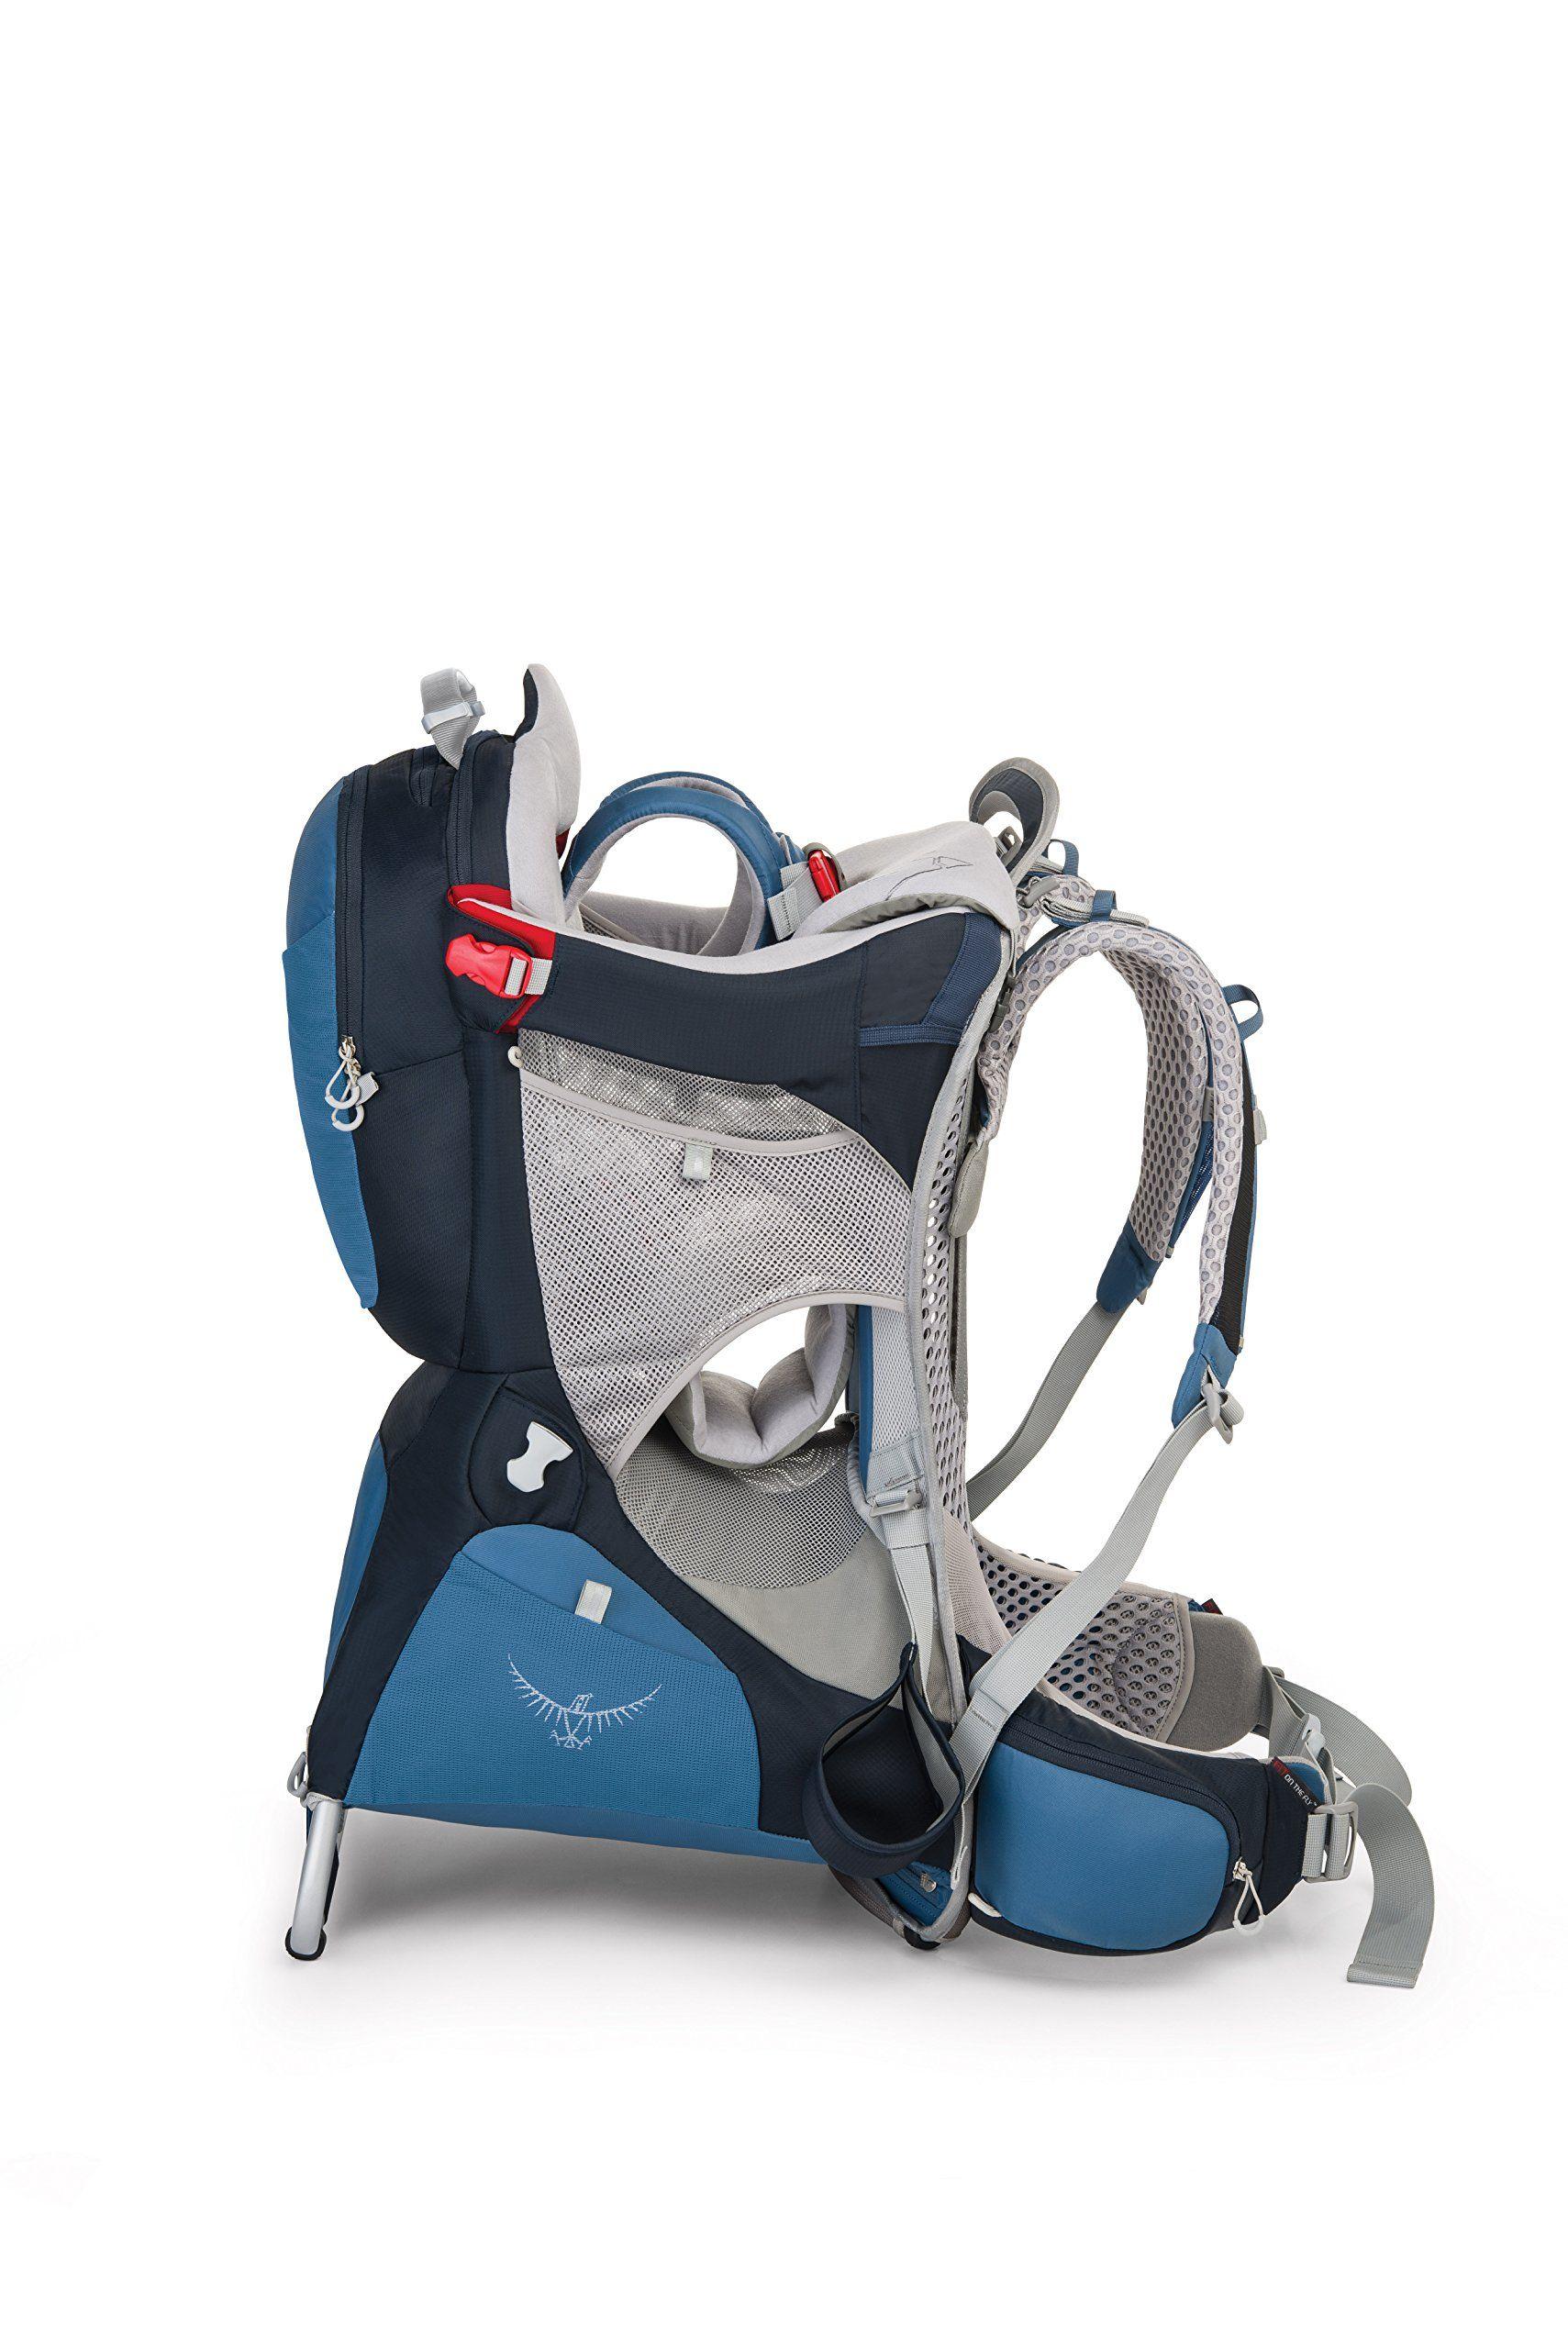 Osprey Packs Poco Ag Plus Child Carrier Seaside Blue Click Image